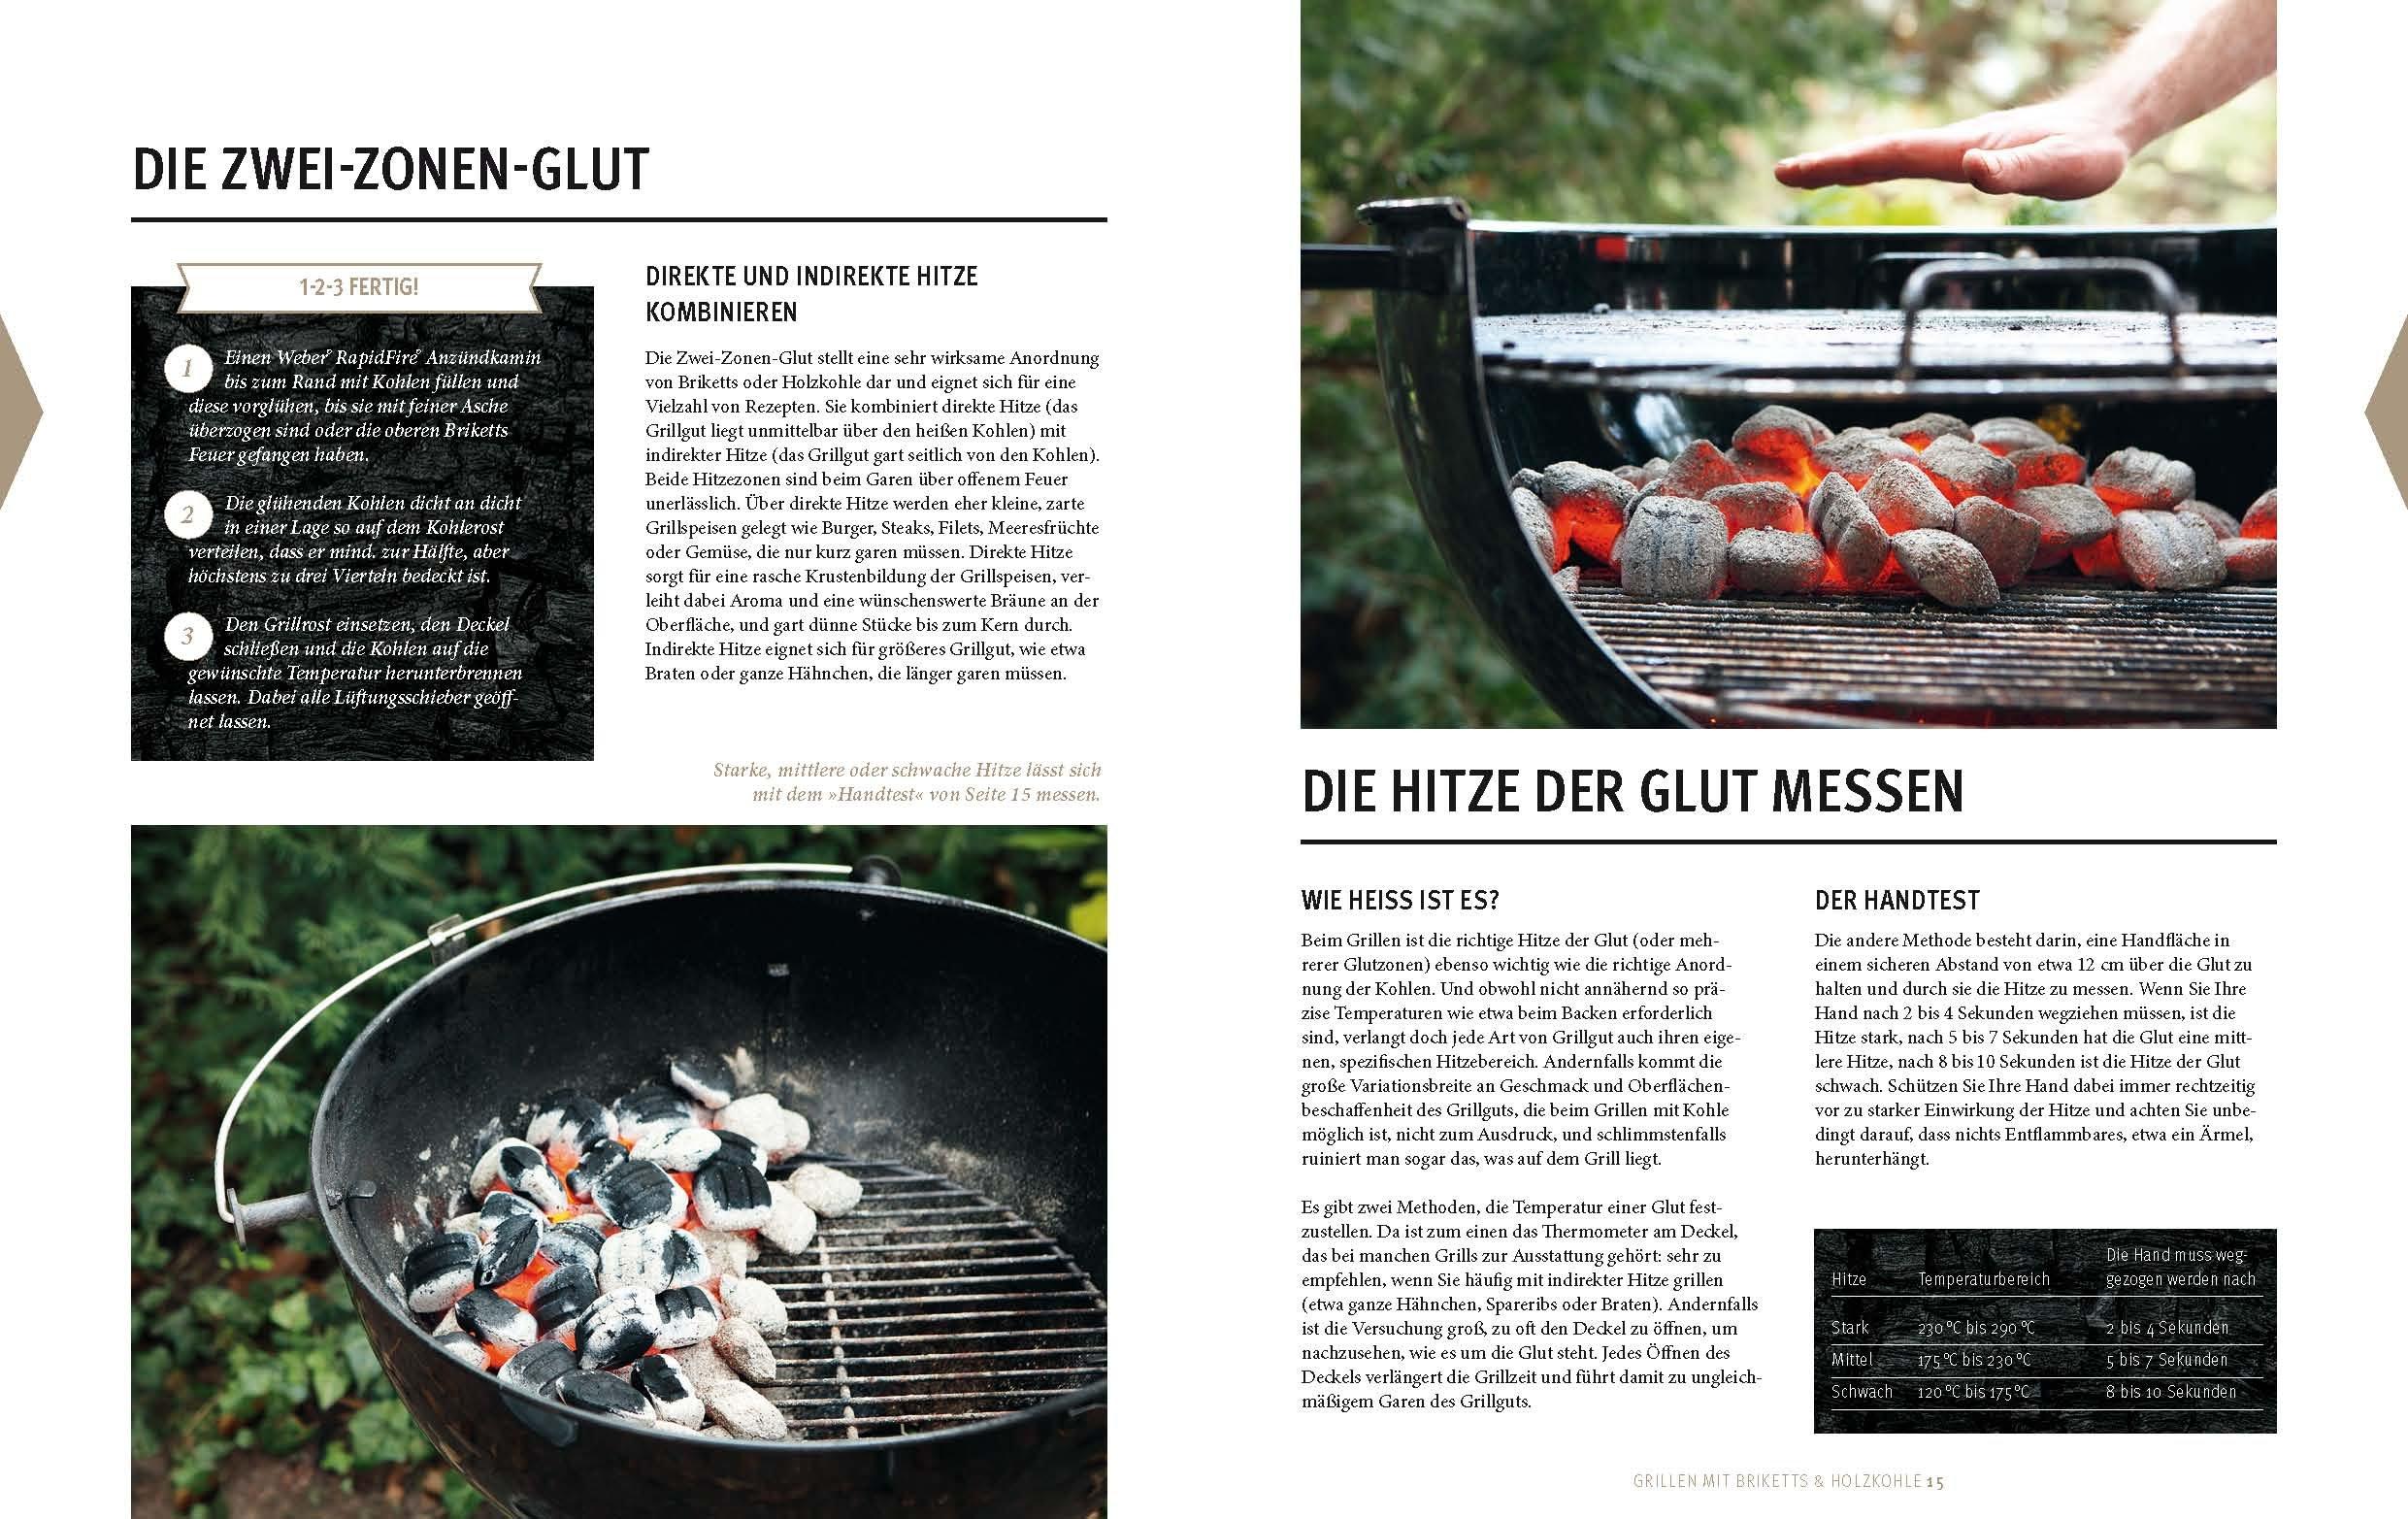 Weber Holzkohlegrill Hitze : Webers grillen mit briketts & holzkohle gu webers grillen: amazon